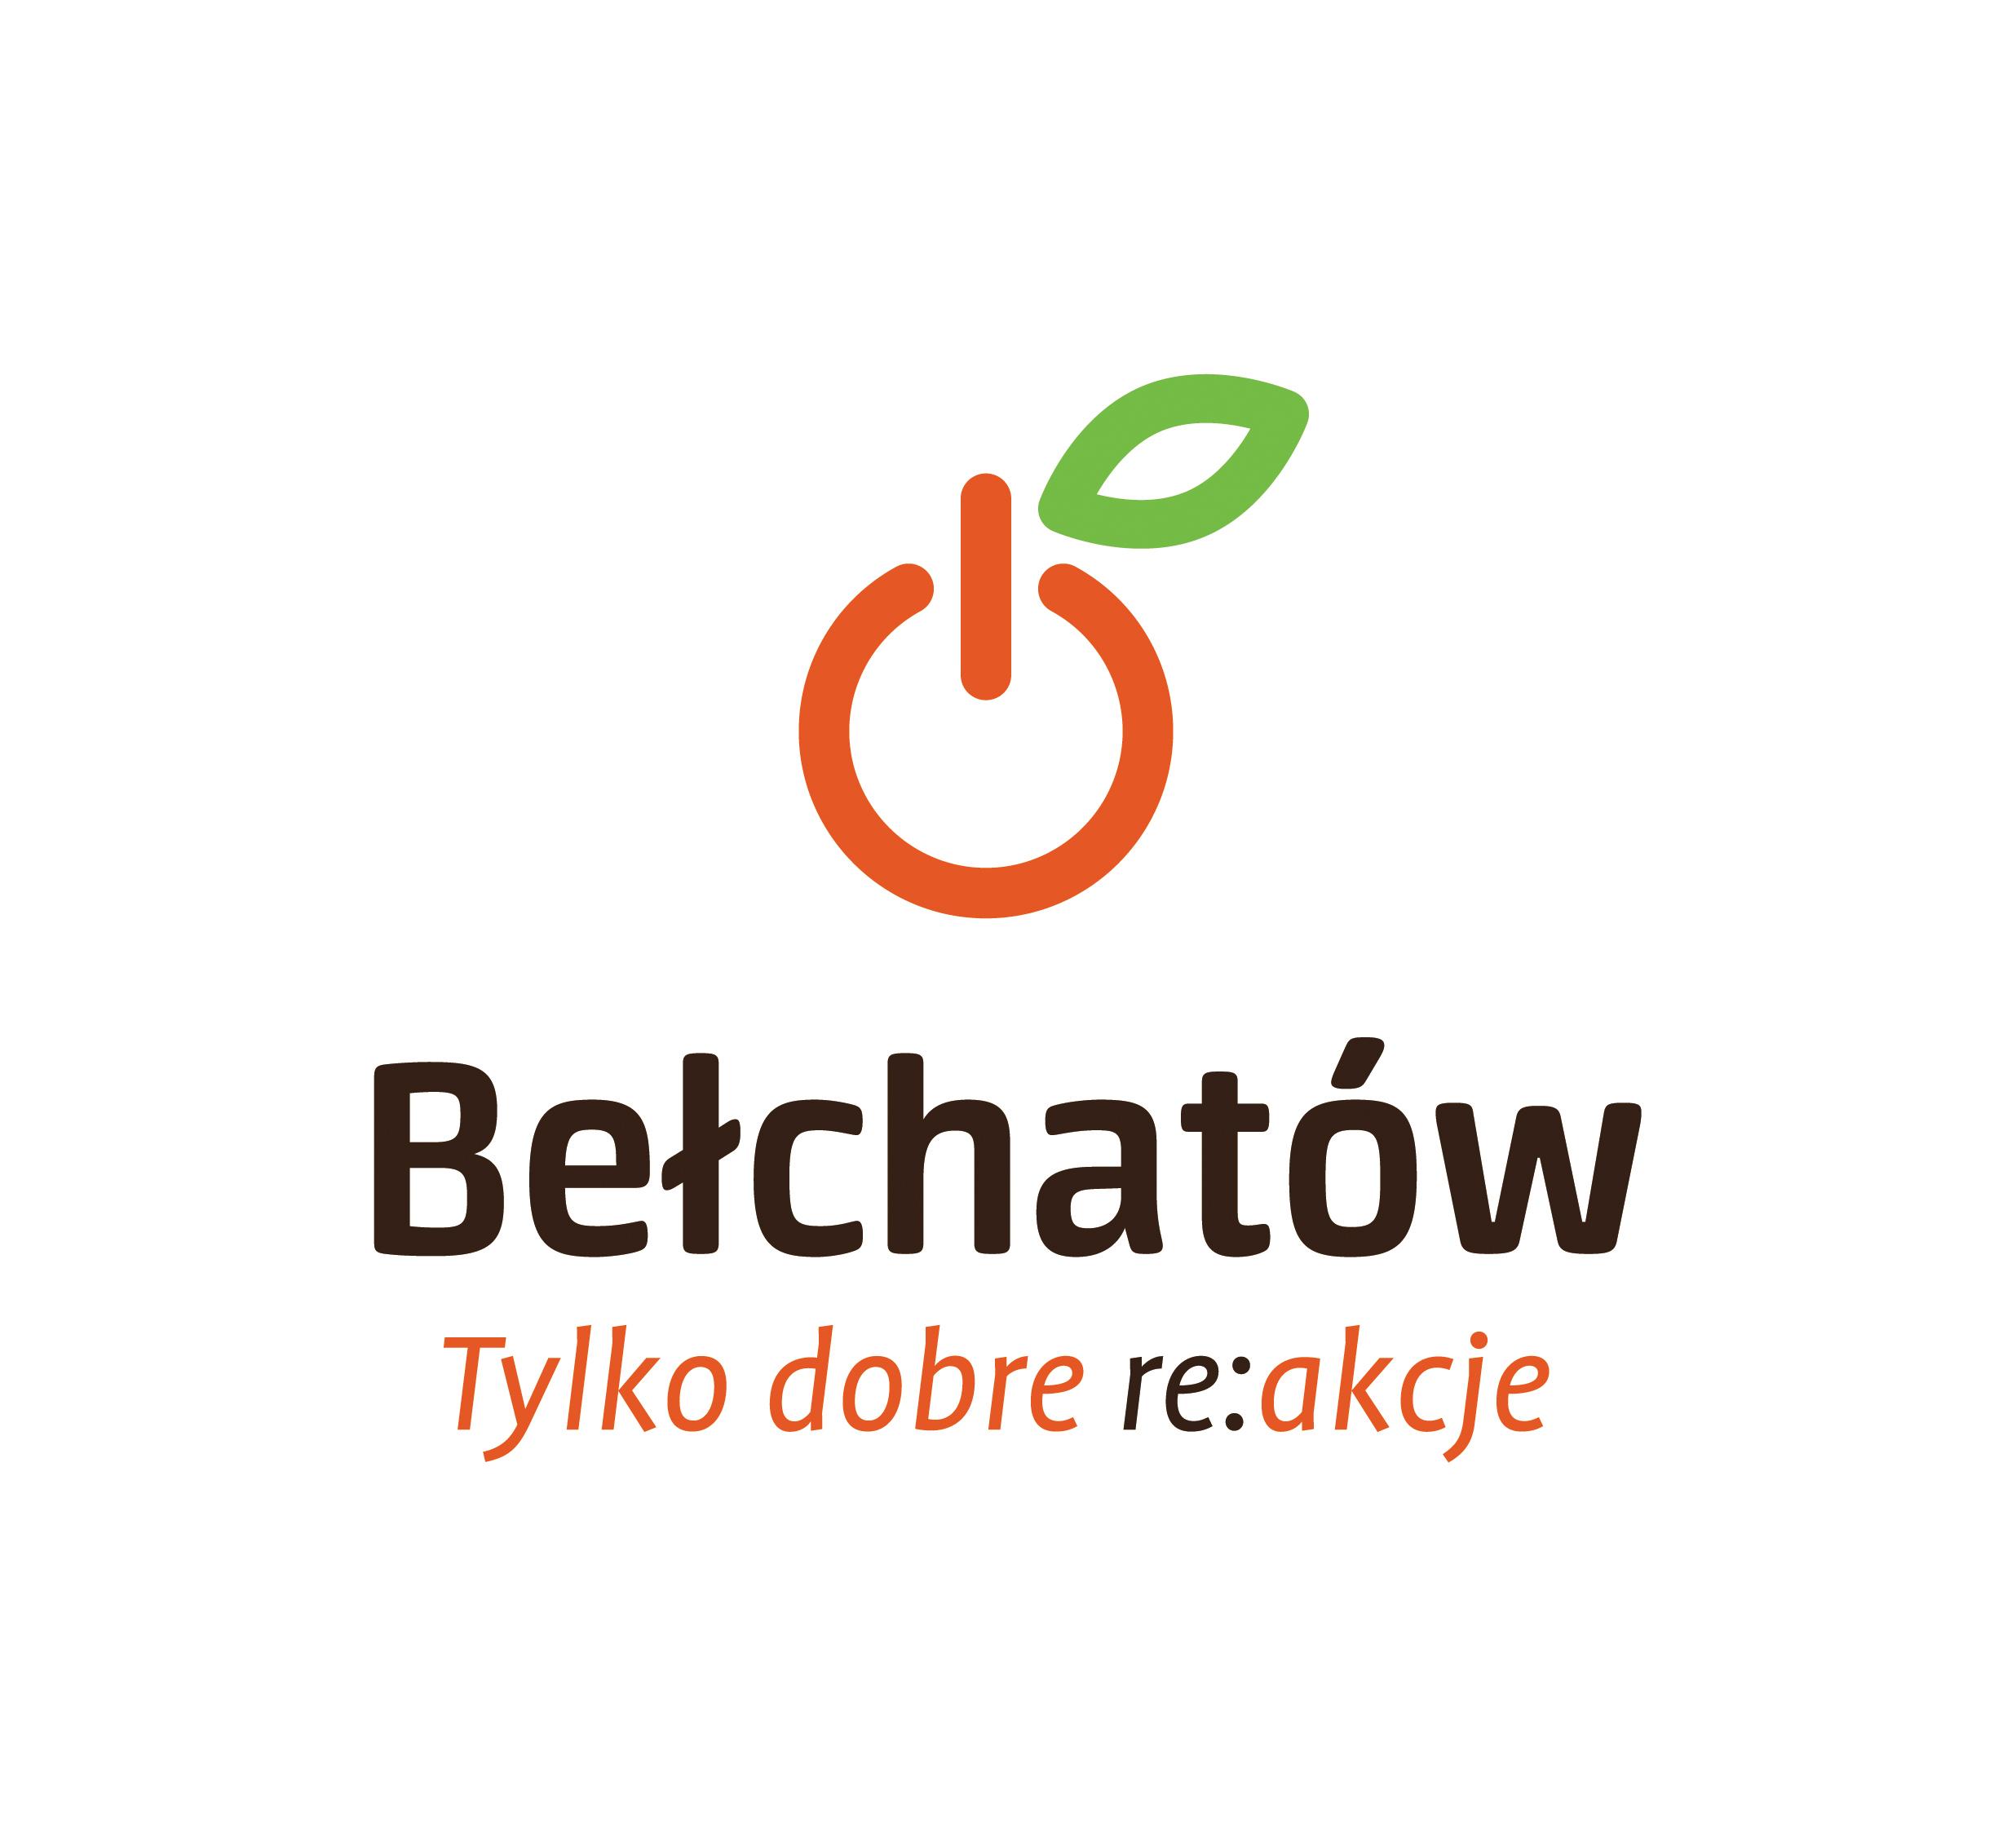 Be chat w logo pionowe has o